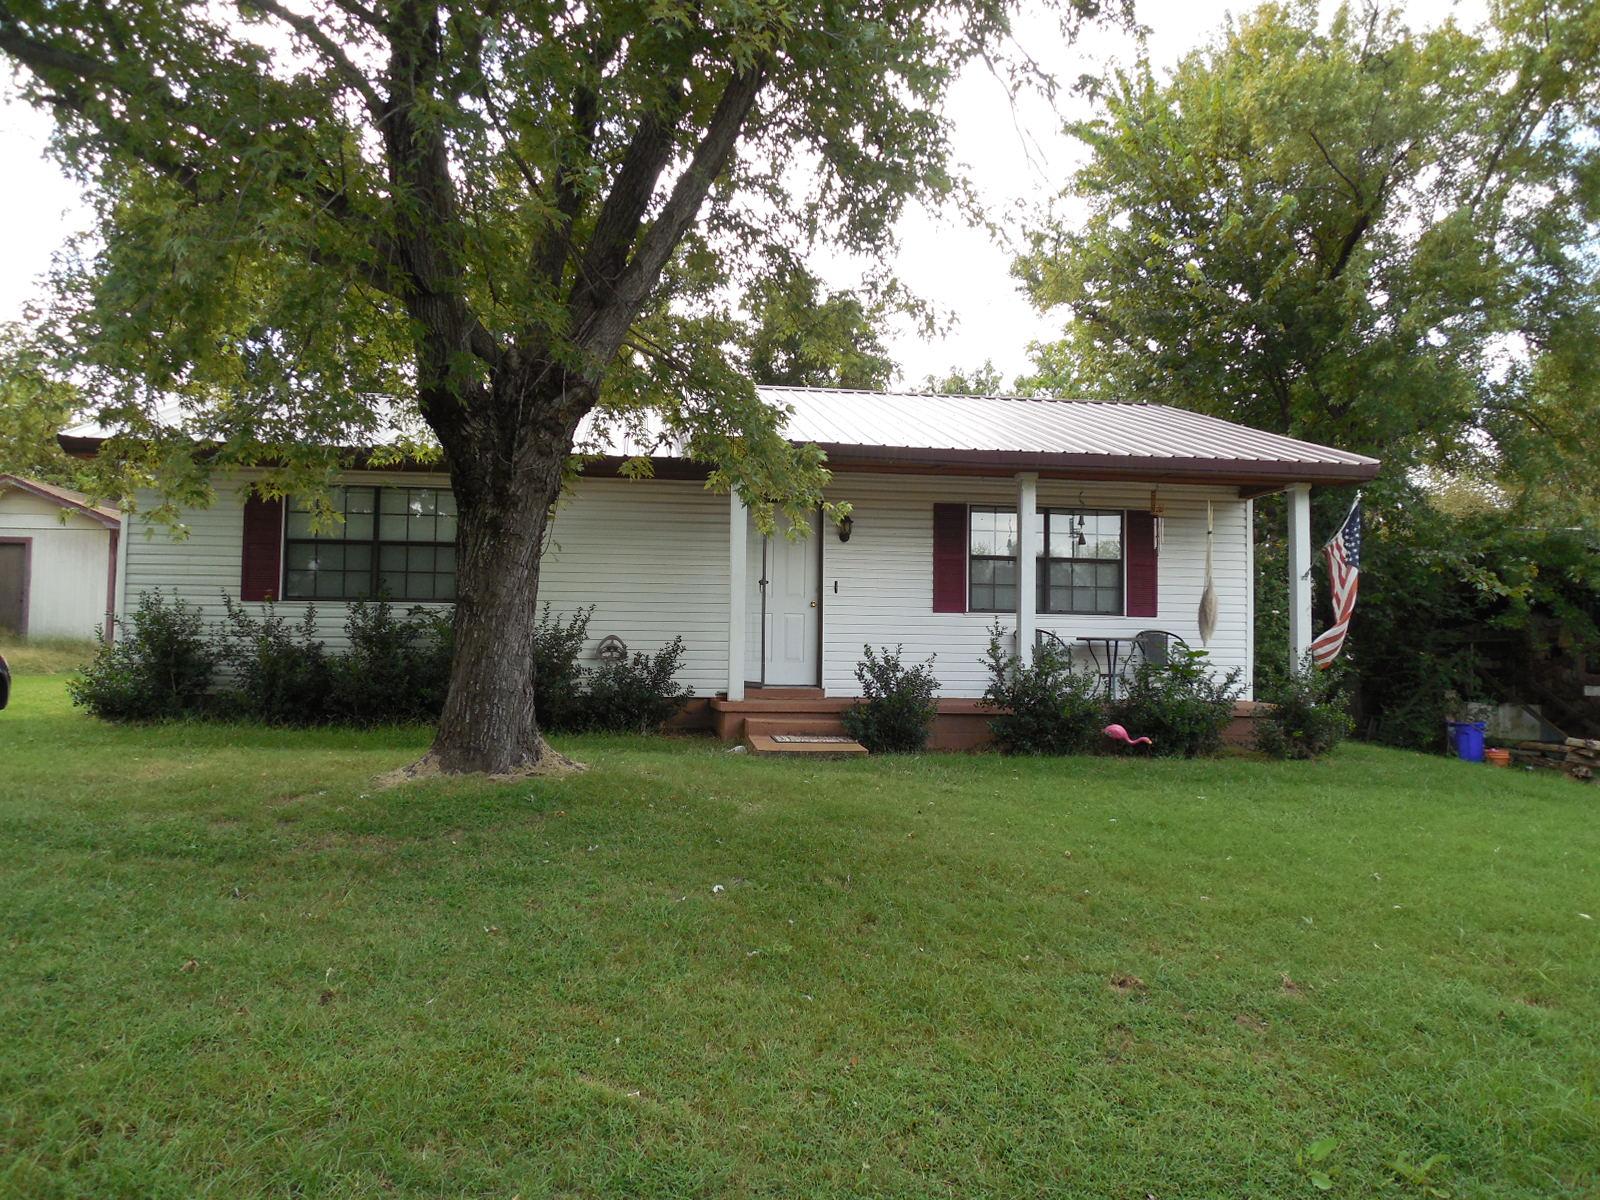 113 McLoud Ave., Arkoma, Oklahoma 74901